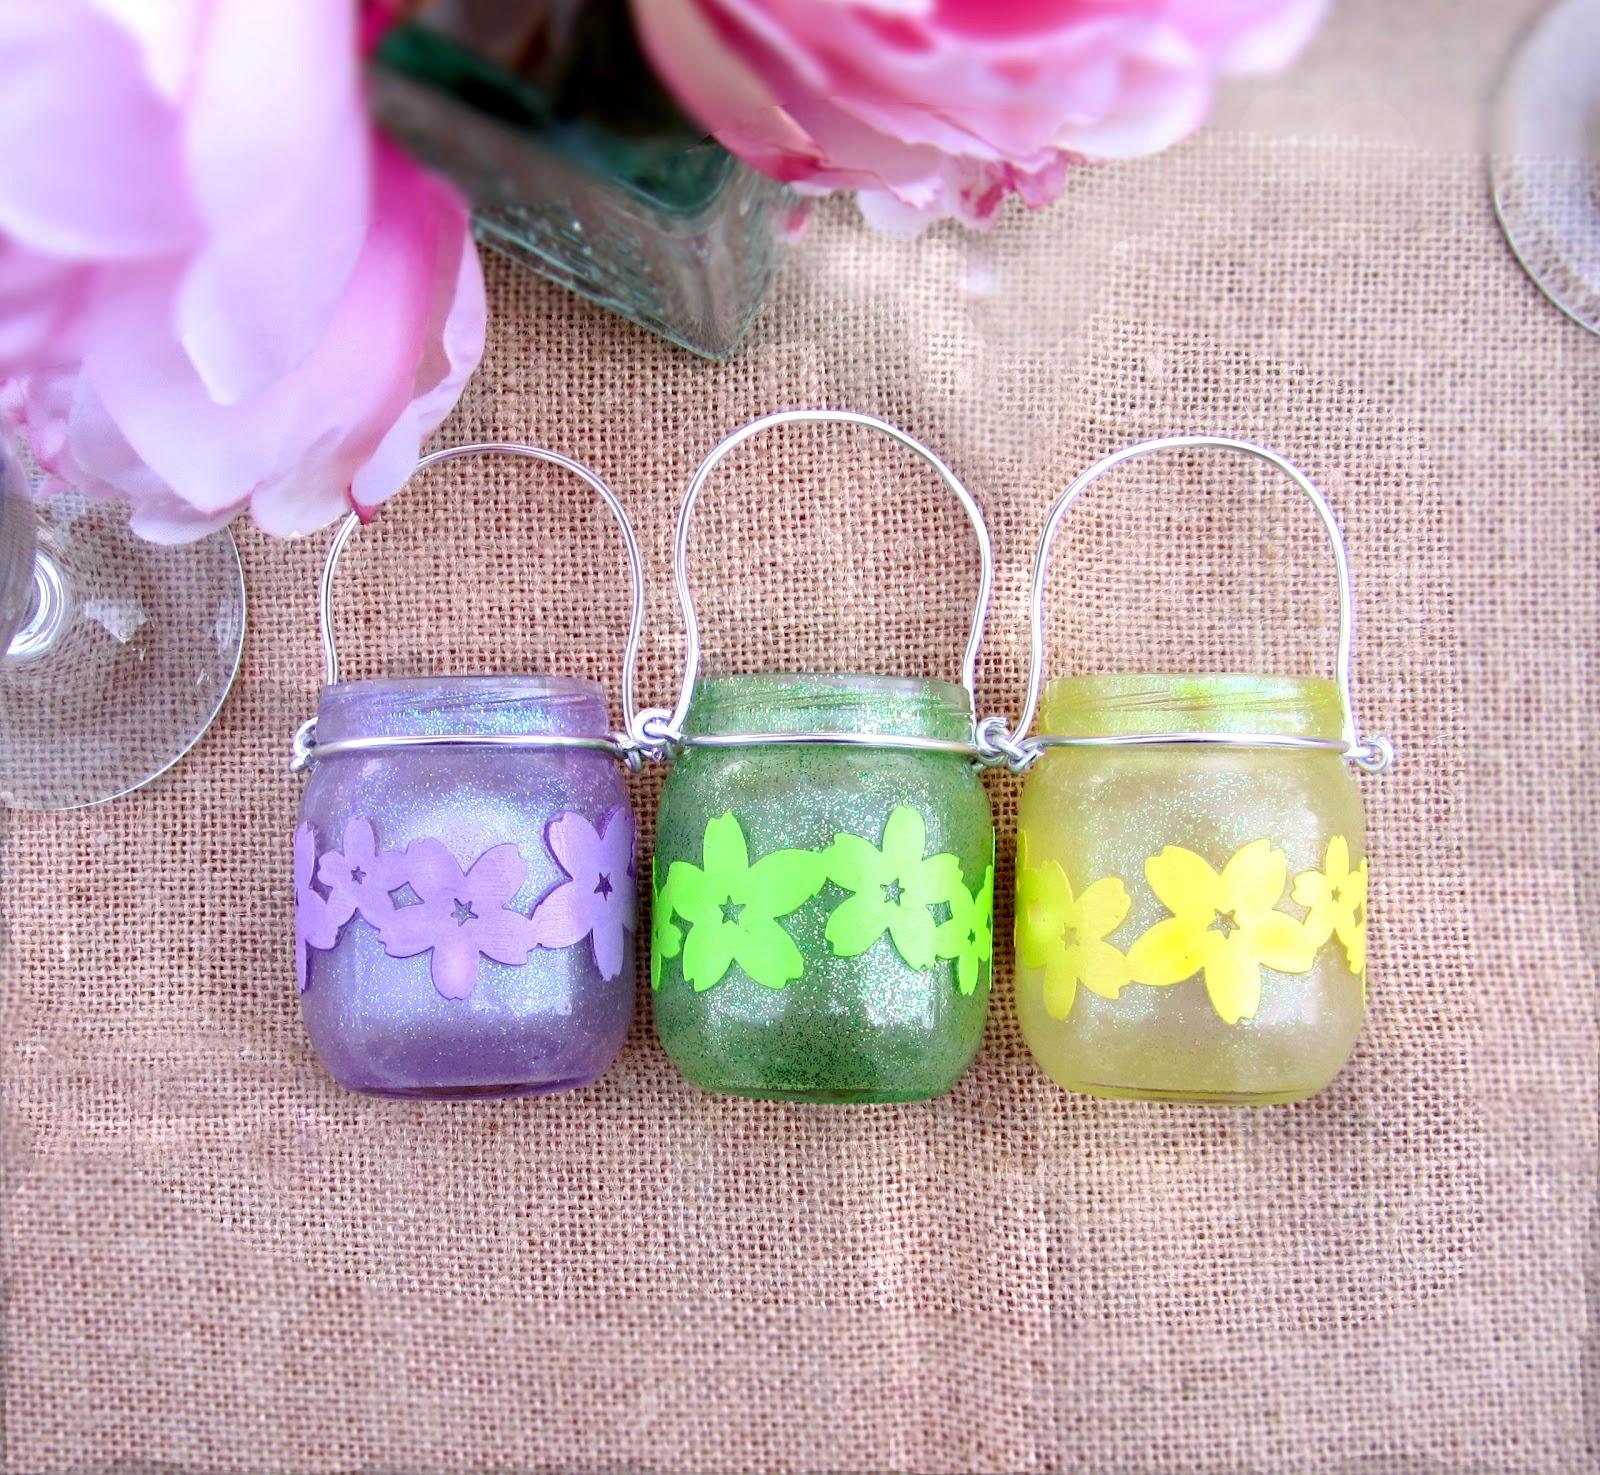 365 Designs Mini Mason Jar Tea Light Candle Holders With Glitter